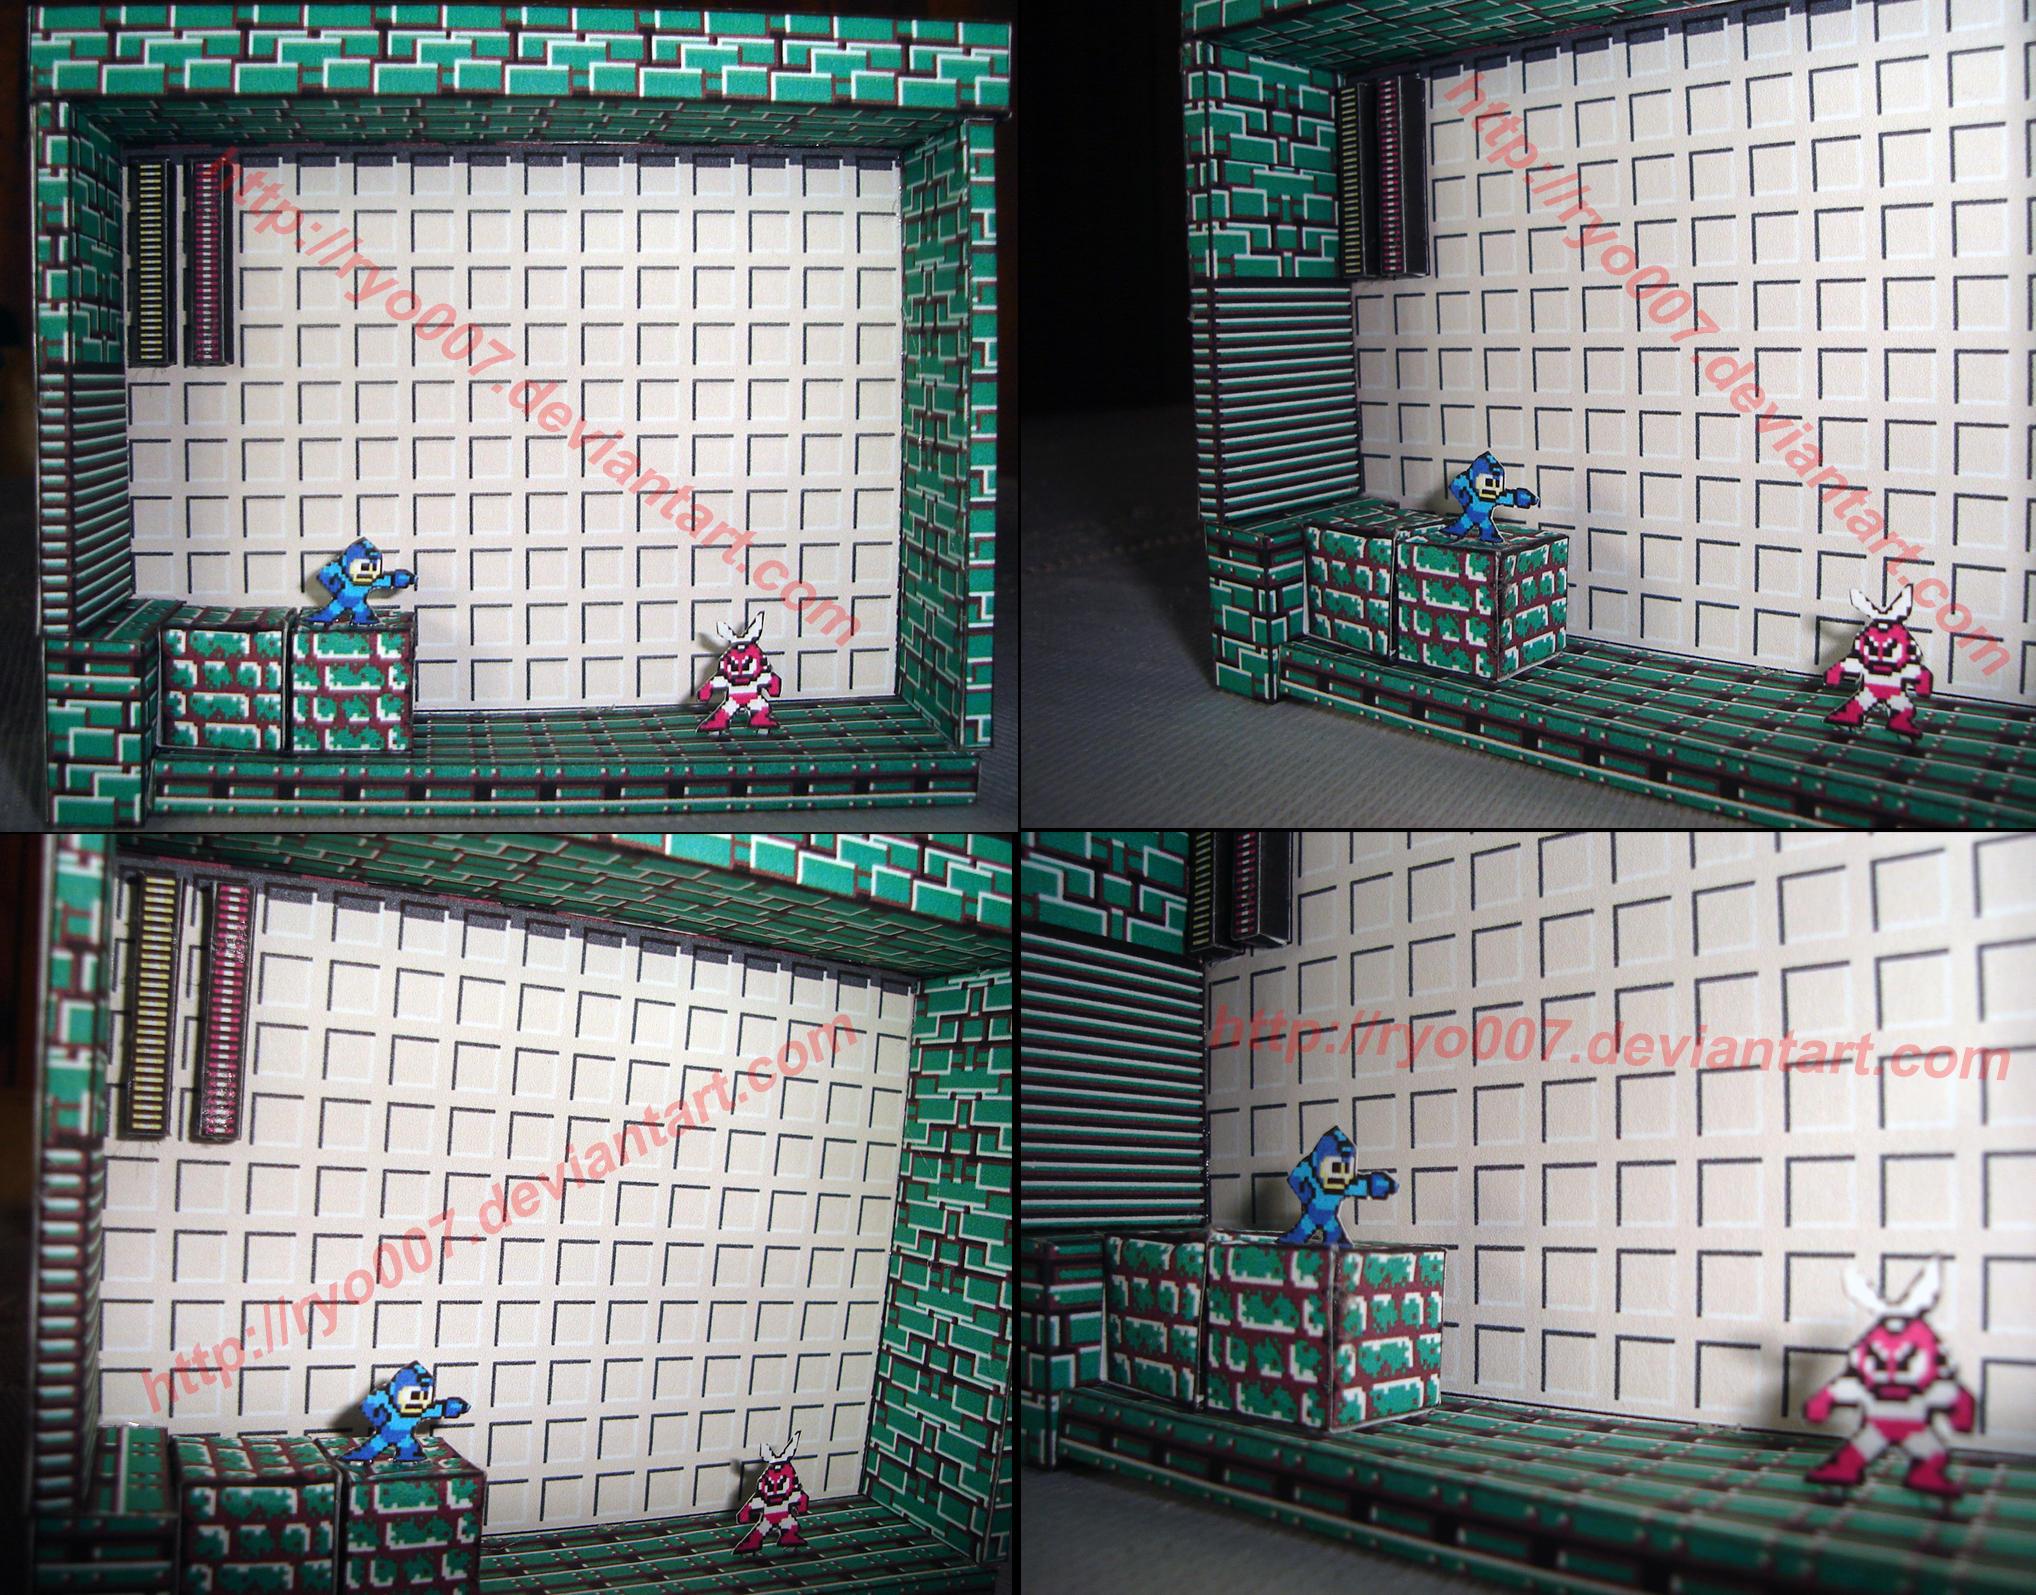 Megaman Vs Cutman Papercraft by ryo007